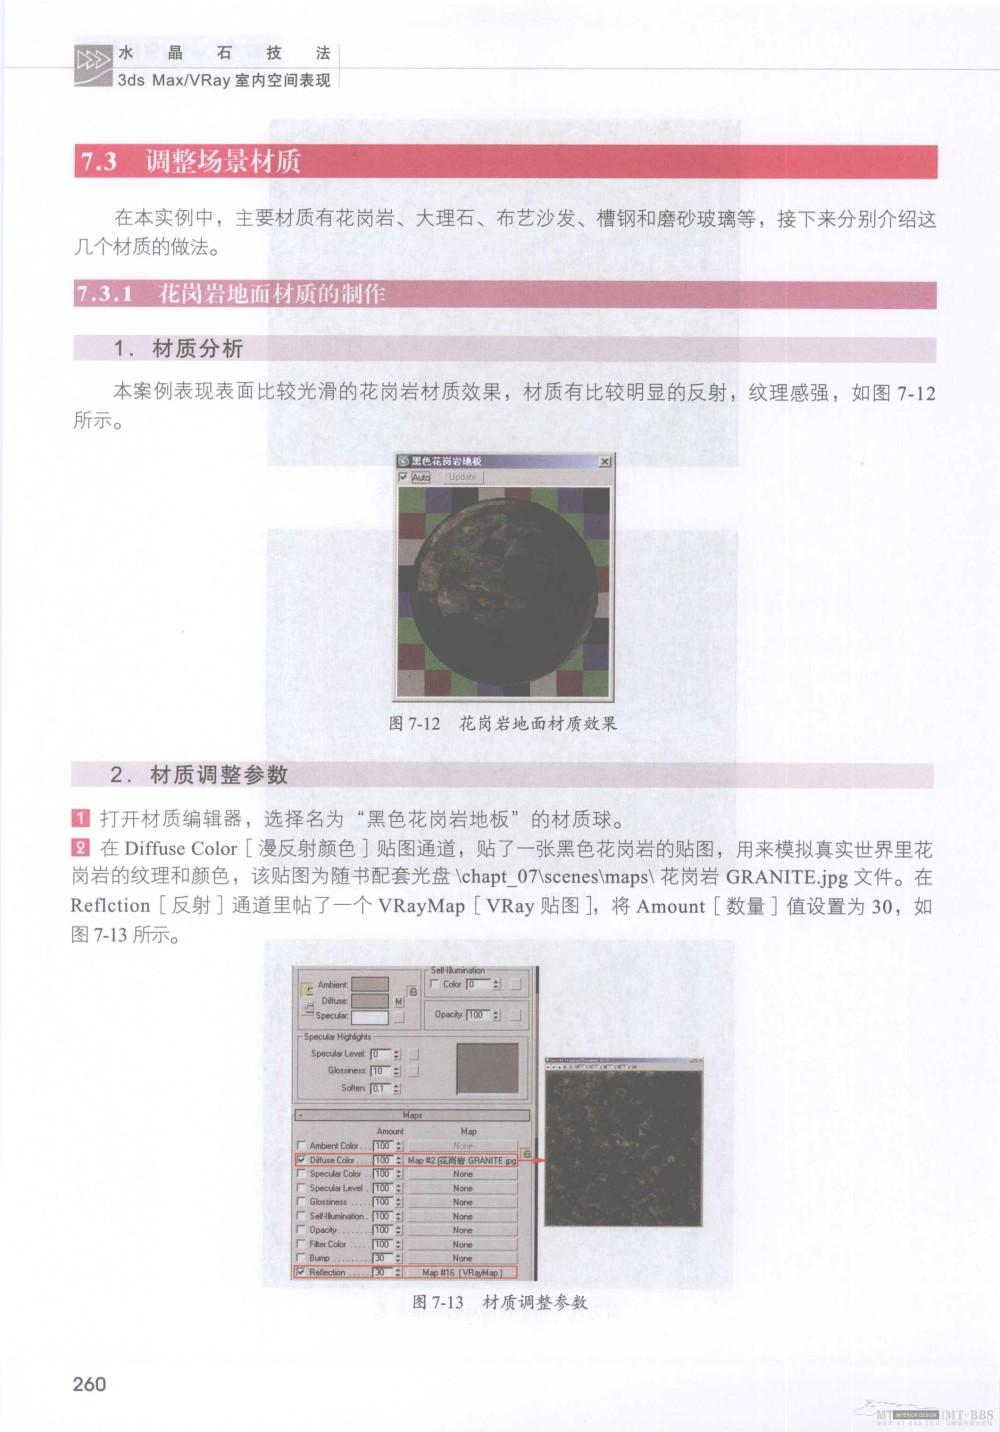 水晶石技法-3ds_Max&VRay室内空间表现_水晶石技法-3ds_Max&VRay室内空间表现_页面_266.jpg